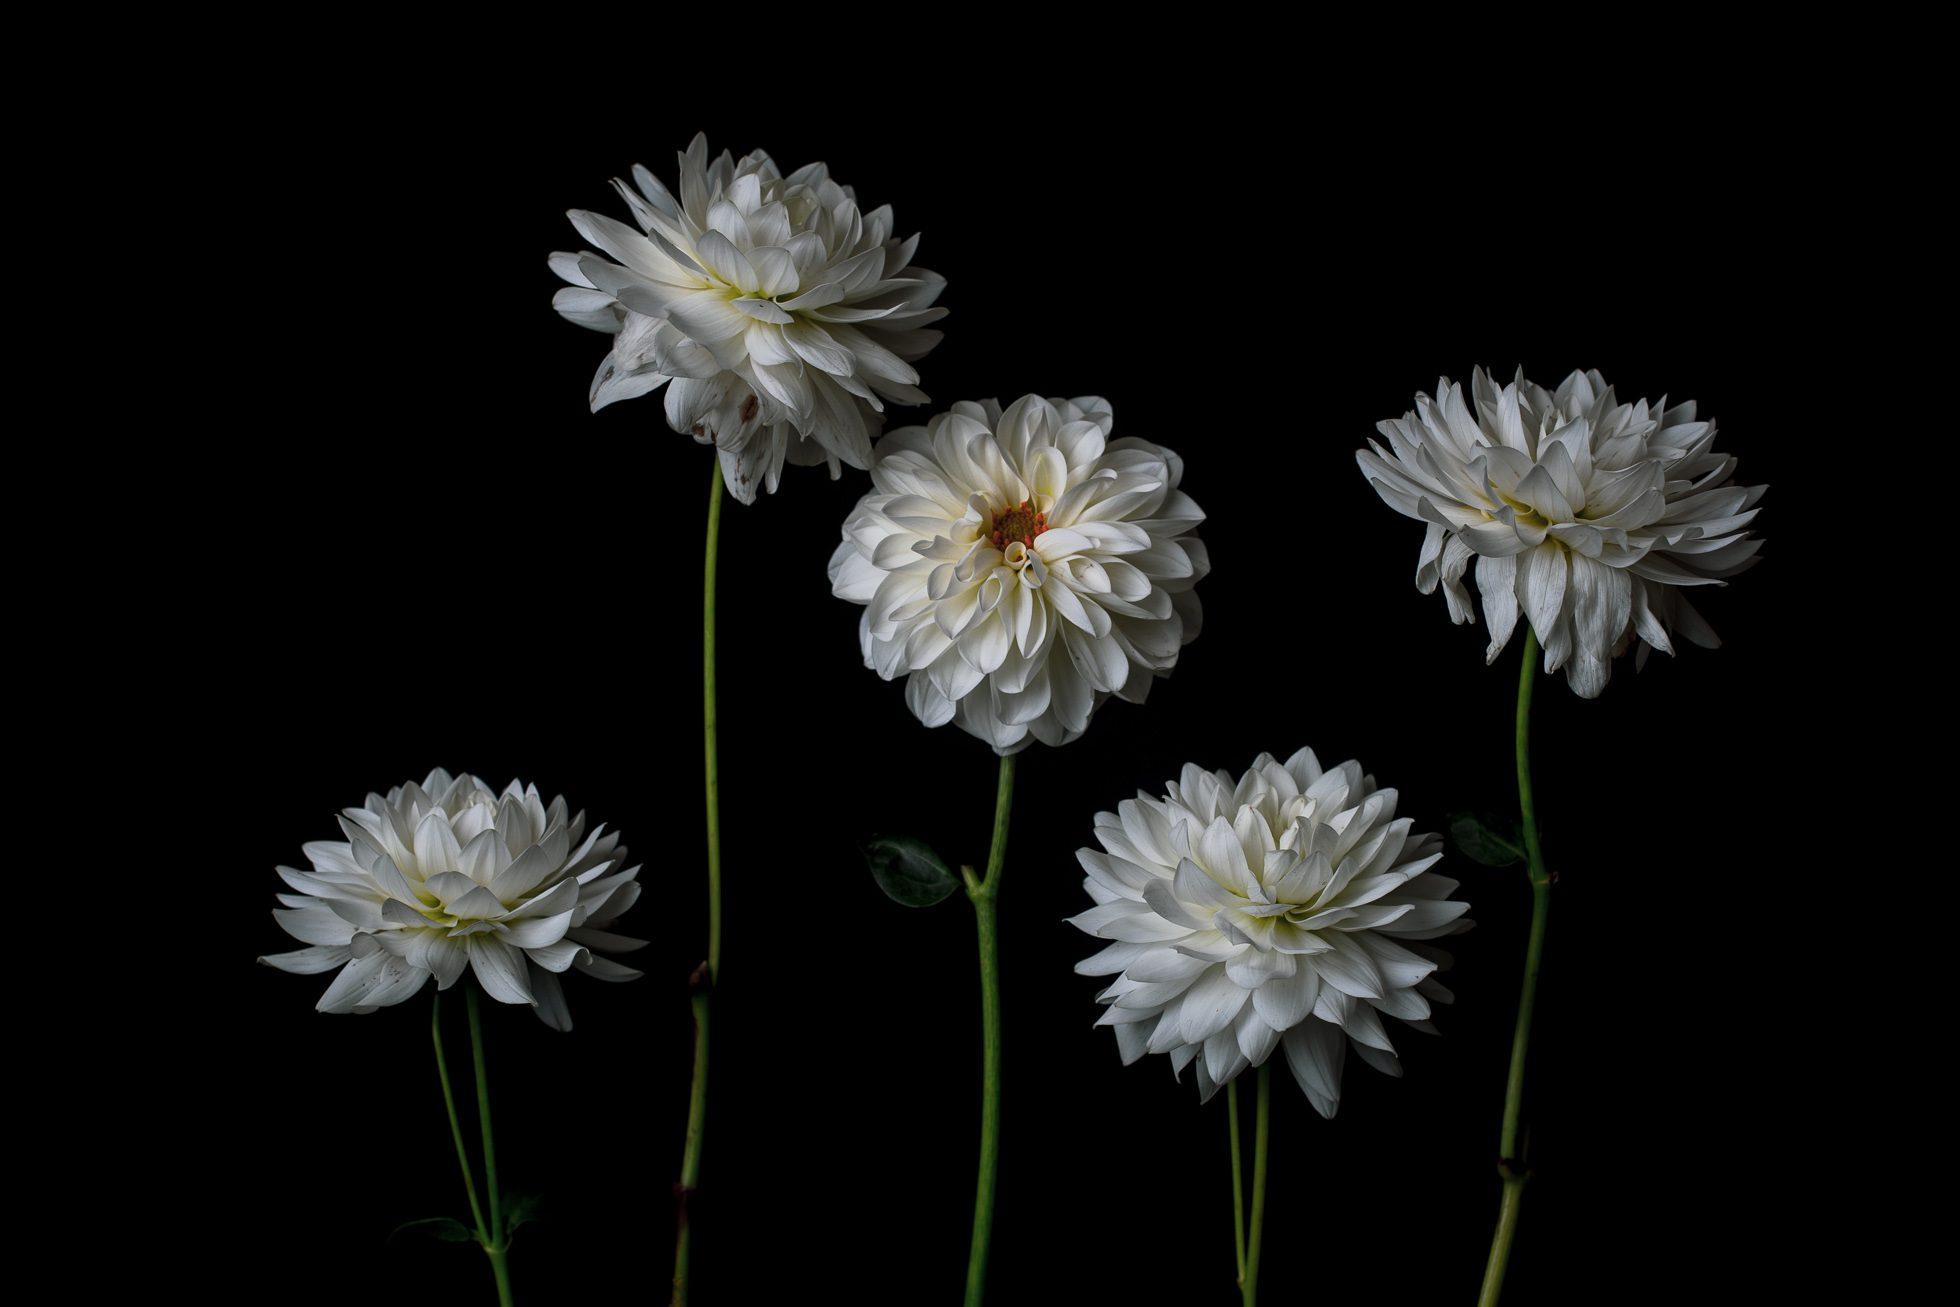 five white flowers on a dark background